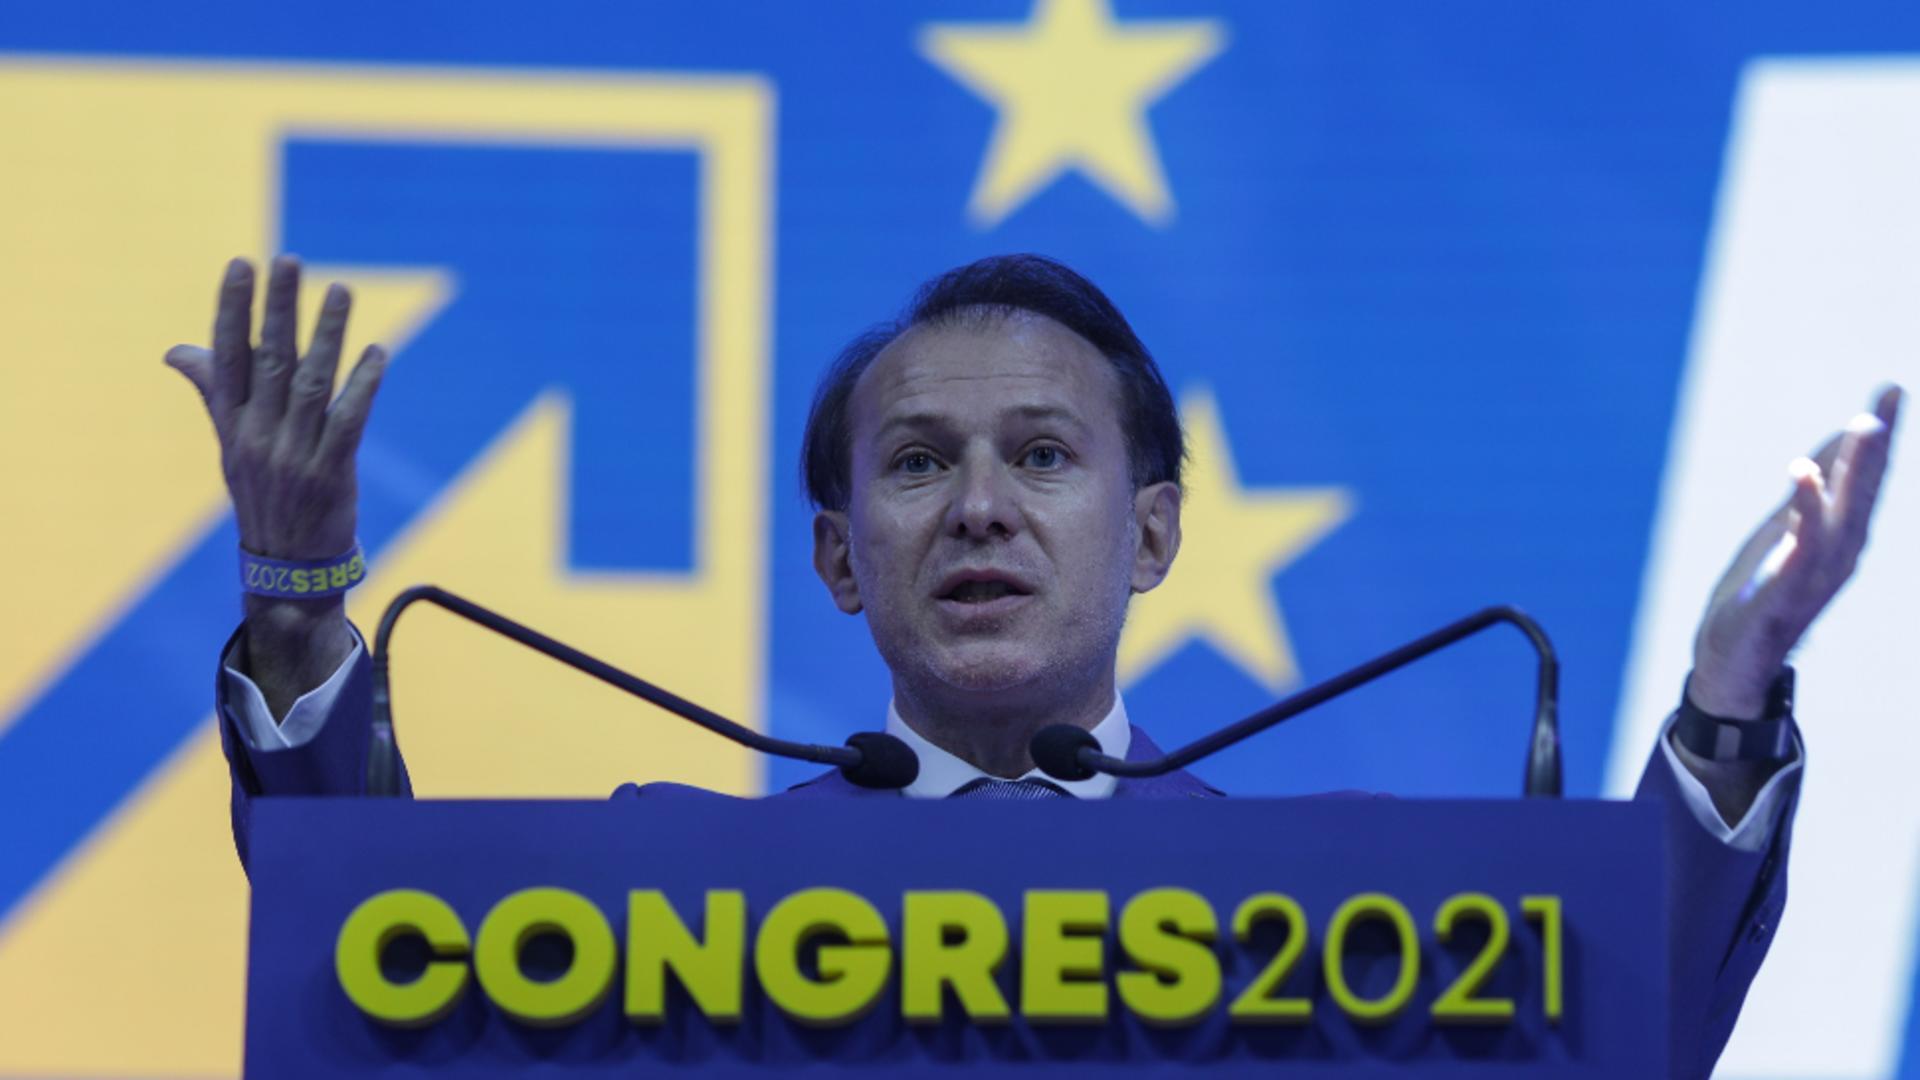 Florin Cîțu, premier, la Congresul PNL, 25 septembrie 2021 Foto: INQUAM/Octav Ganea